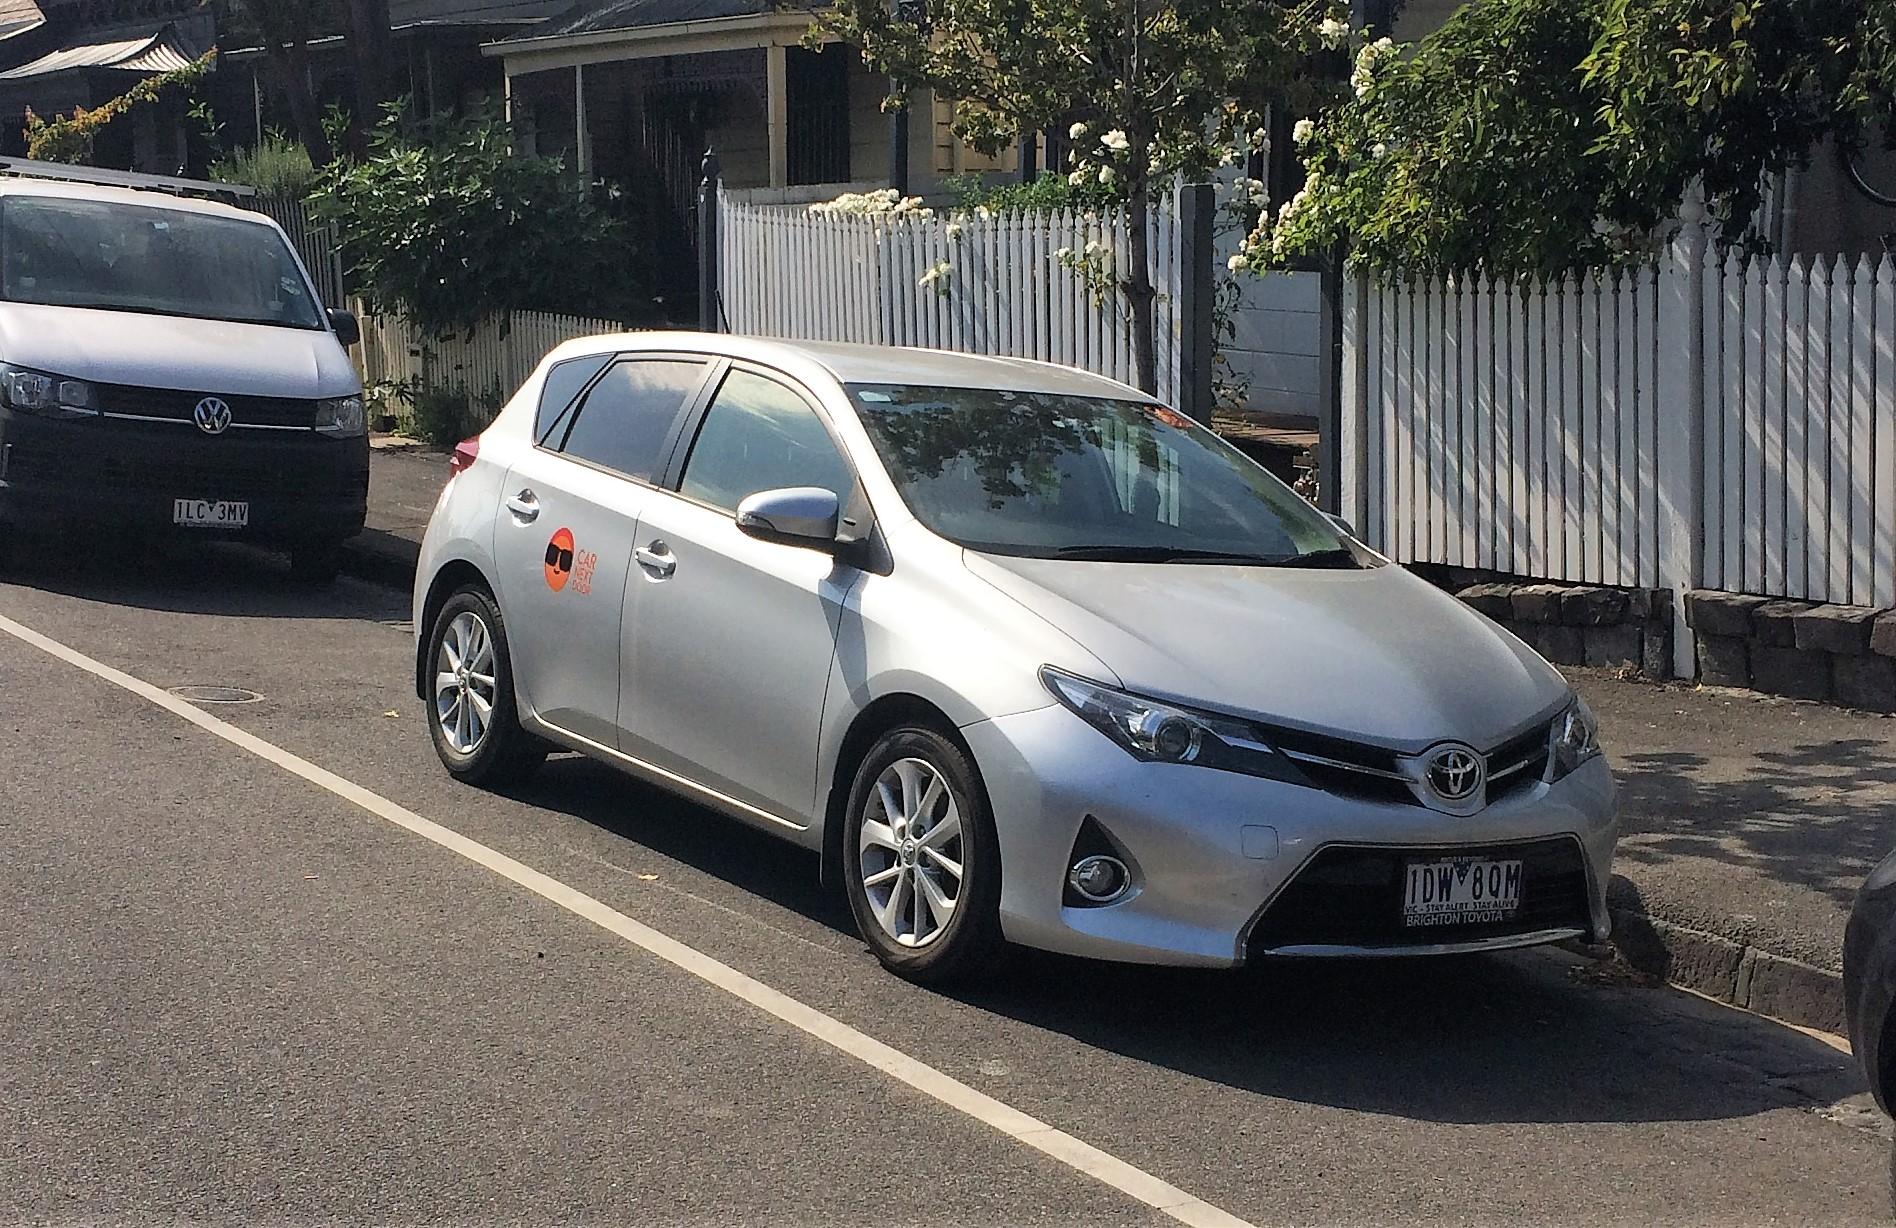 Picture of Gwyn-Ann's 2015 Toyota Corolla